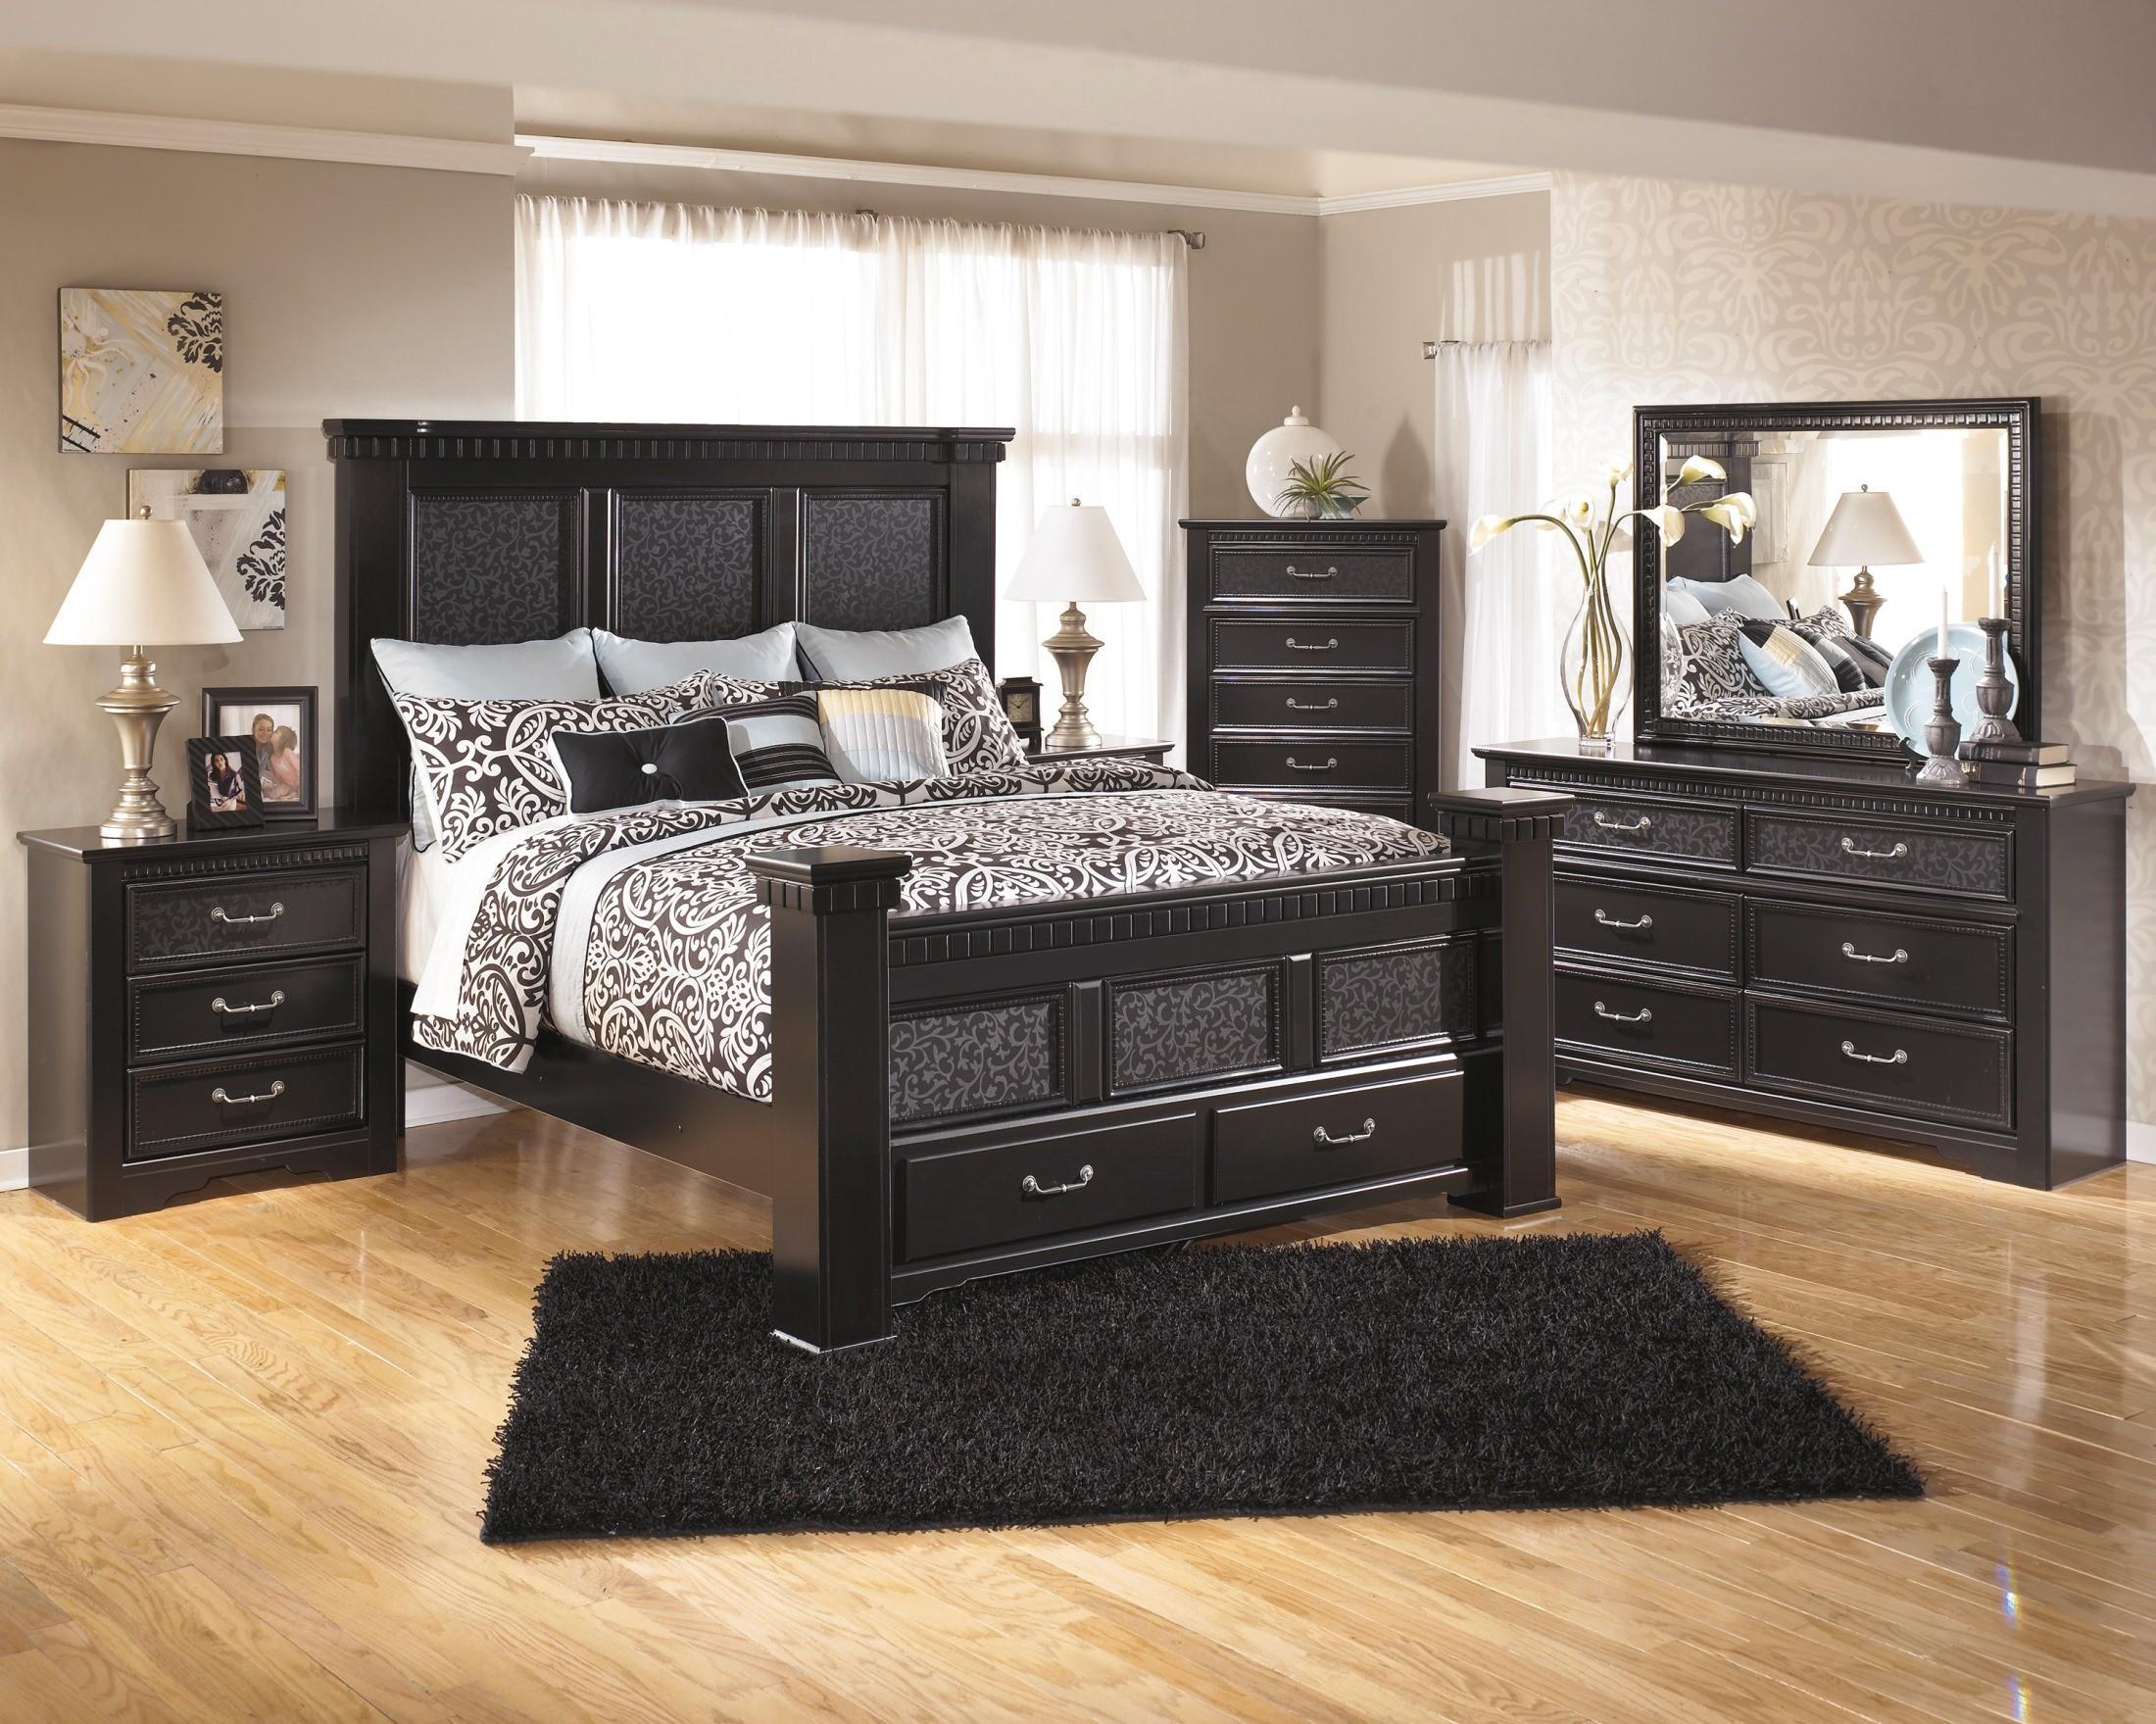 Cavallino Mansion Storage Bedroom Set from Ashley (B291) | Coleman ...